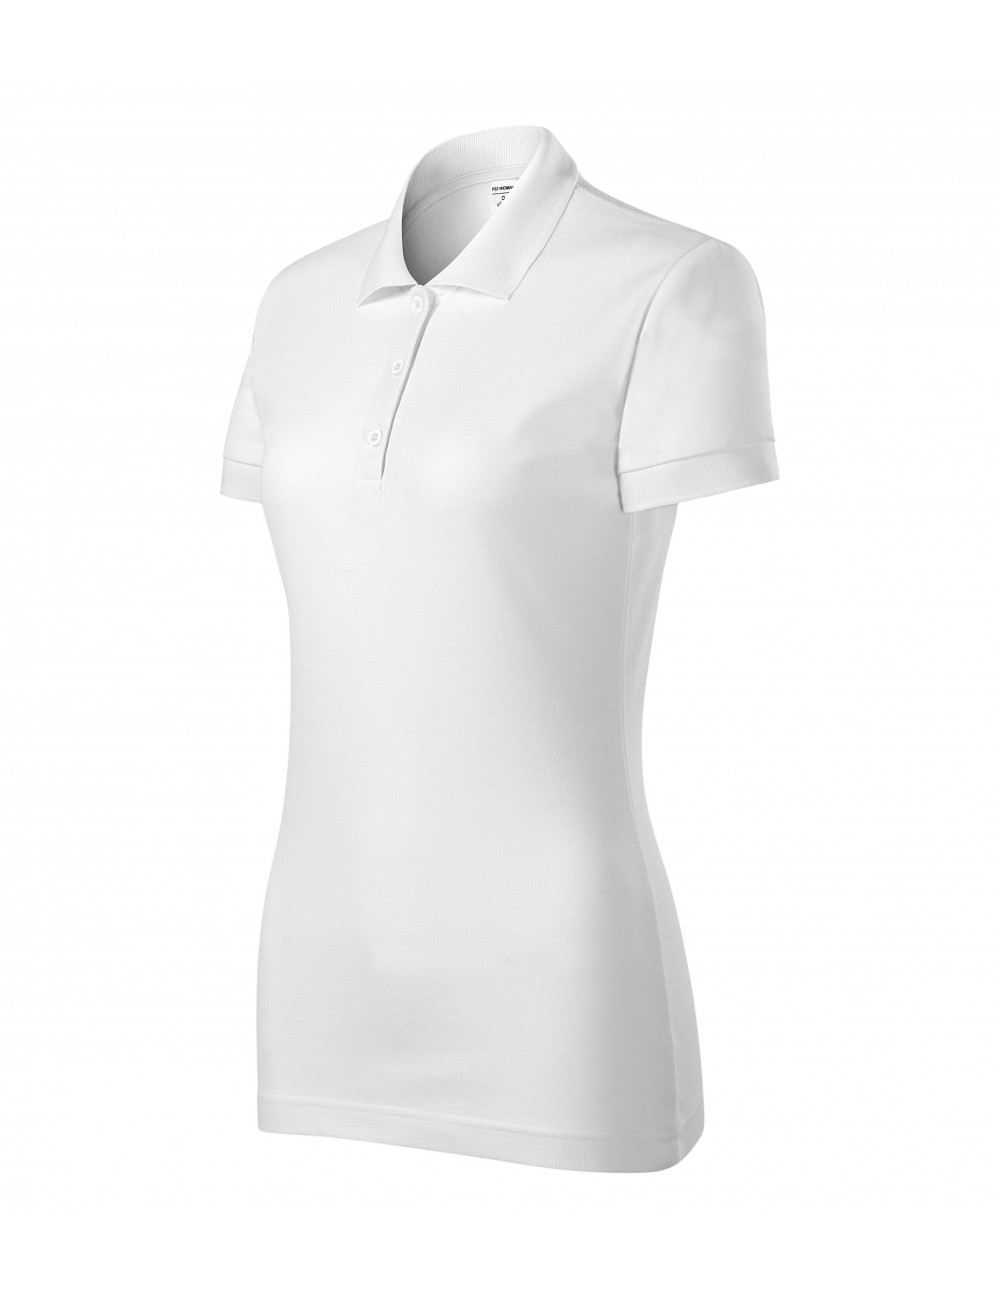 Adler PICCOLIO Koszulka polo damska Joy P22 biały